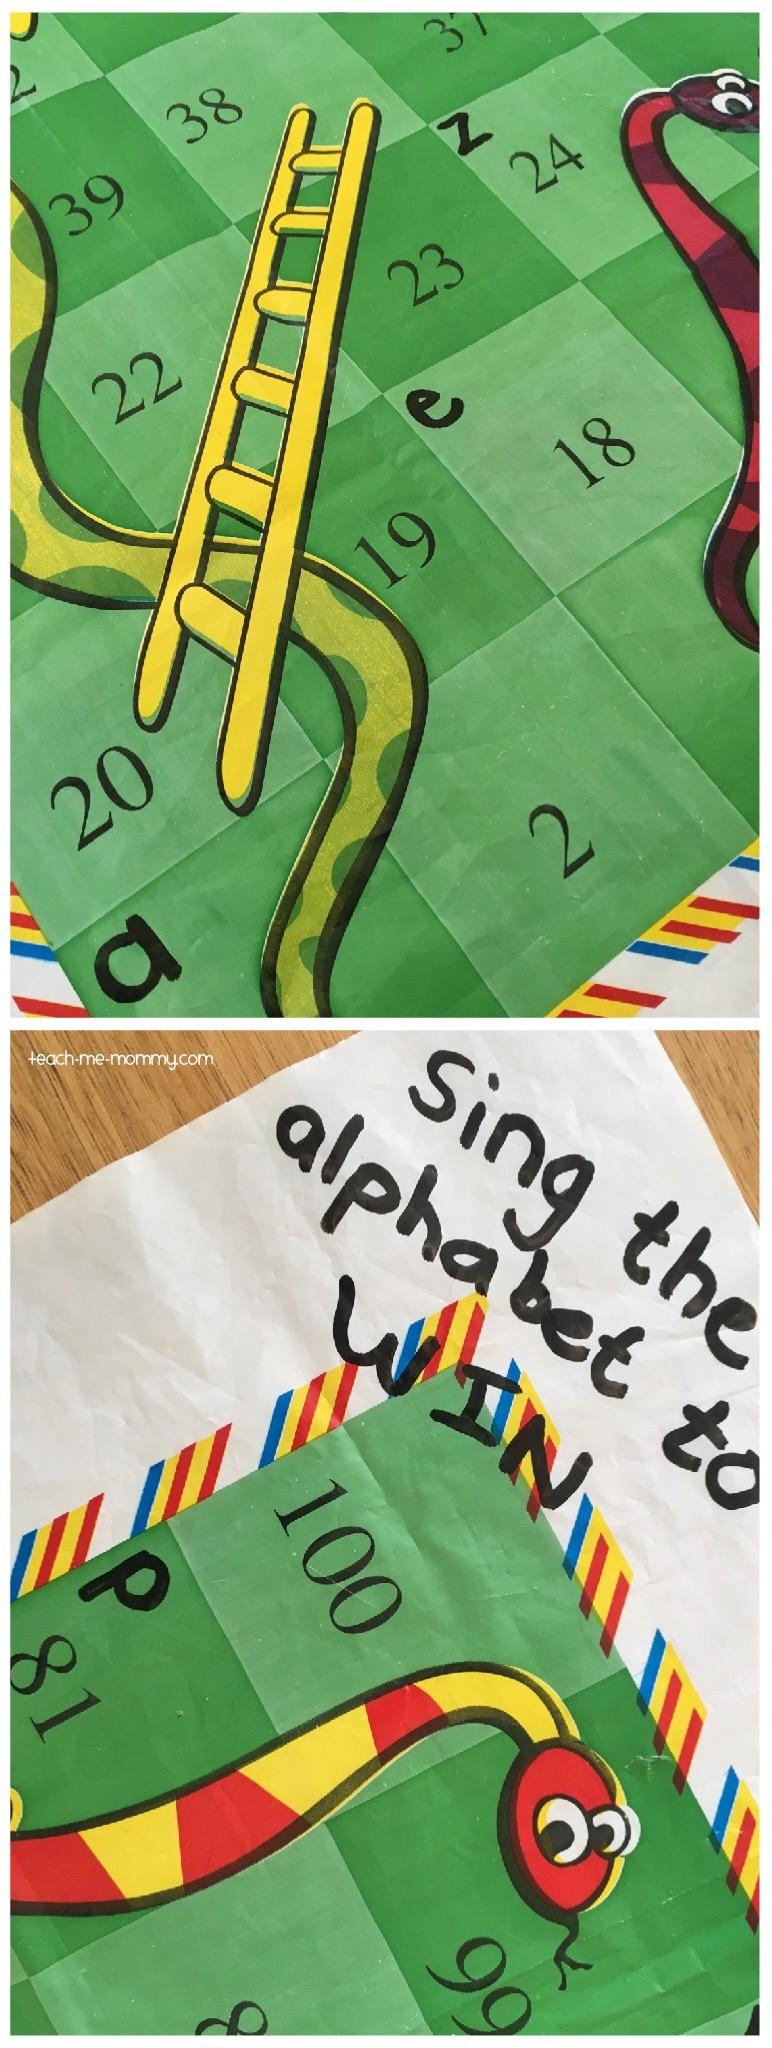 Adding ABCs